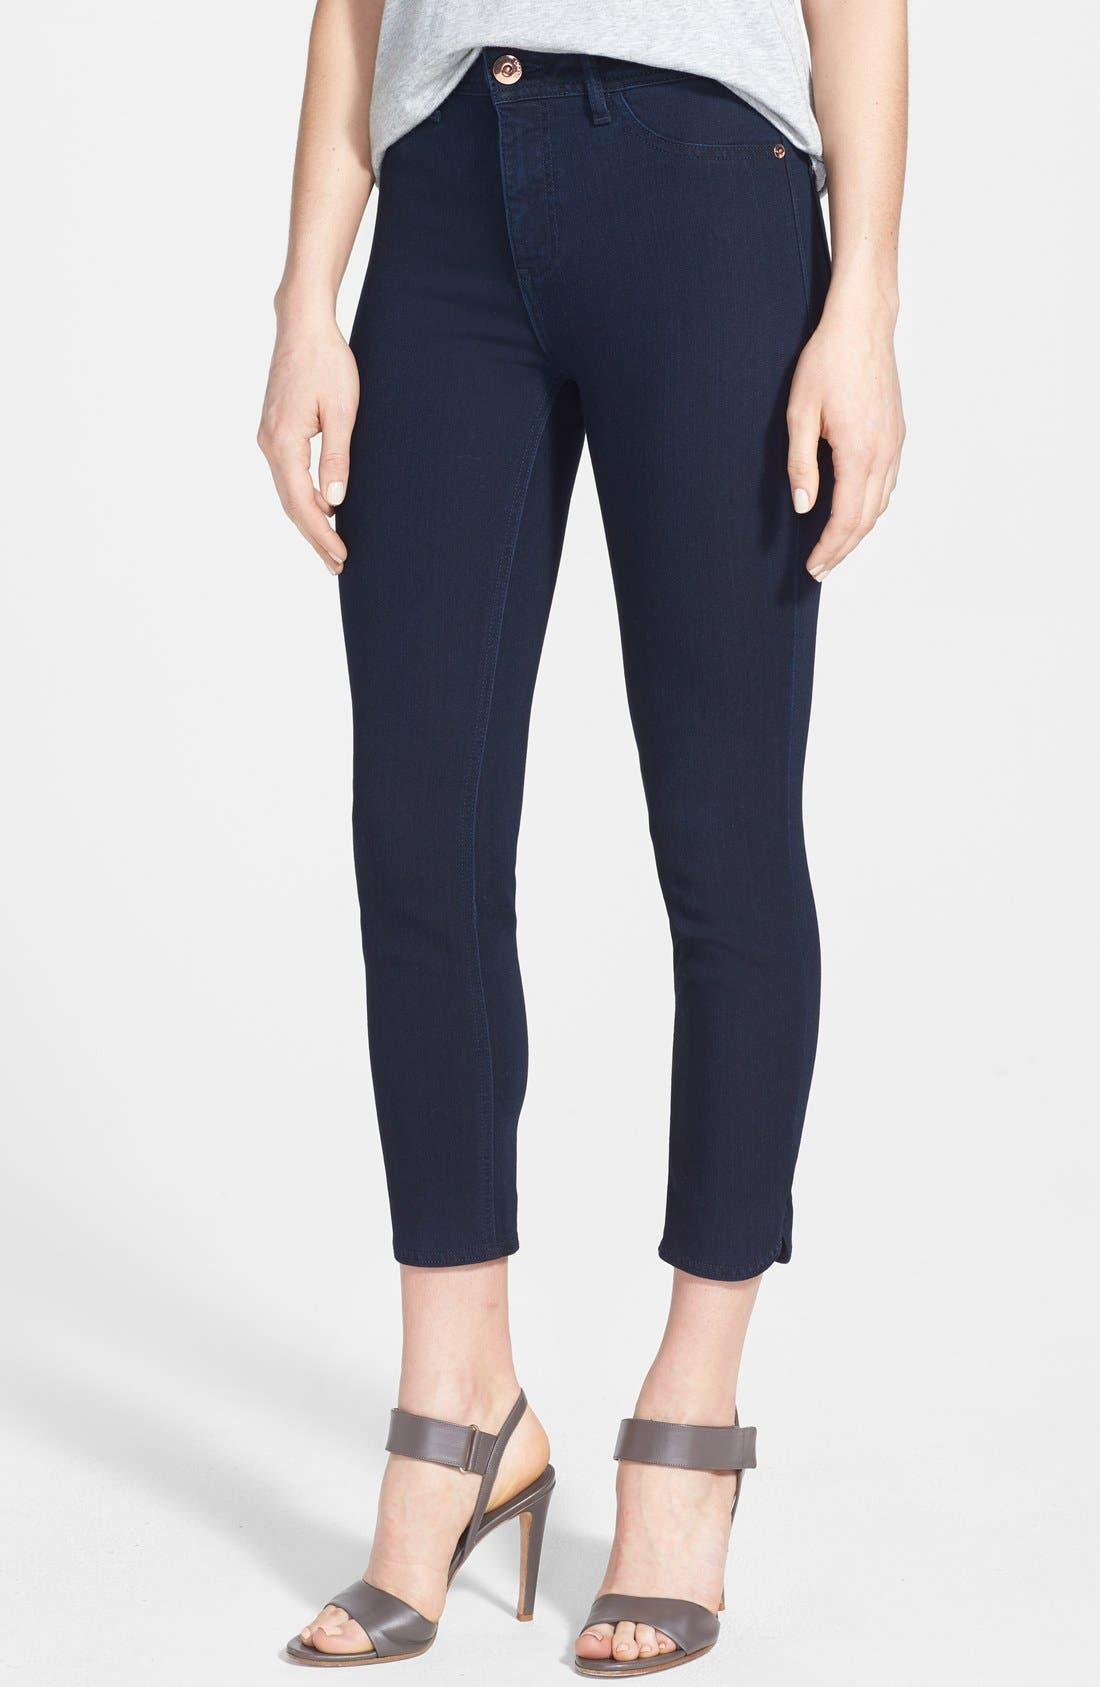 Main Image - DL1961 'Bardot High Rise' Crop Jeans (Flat Iron)